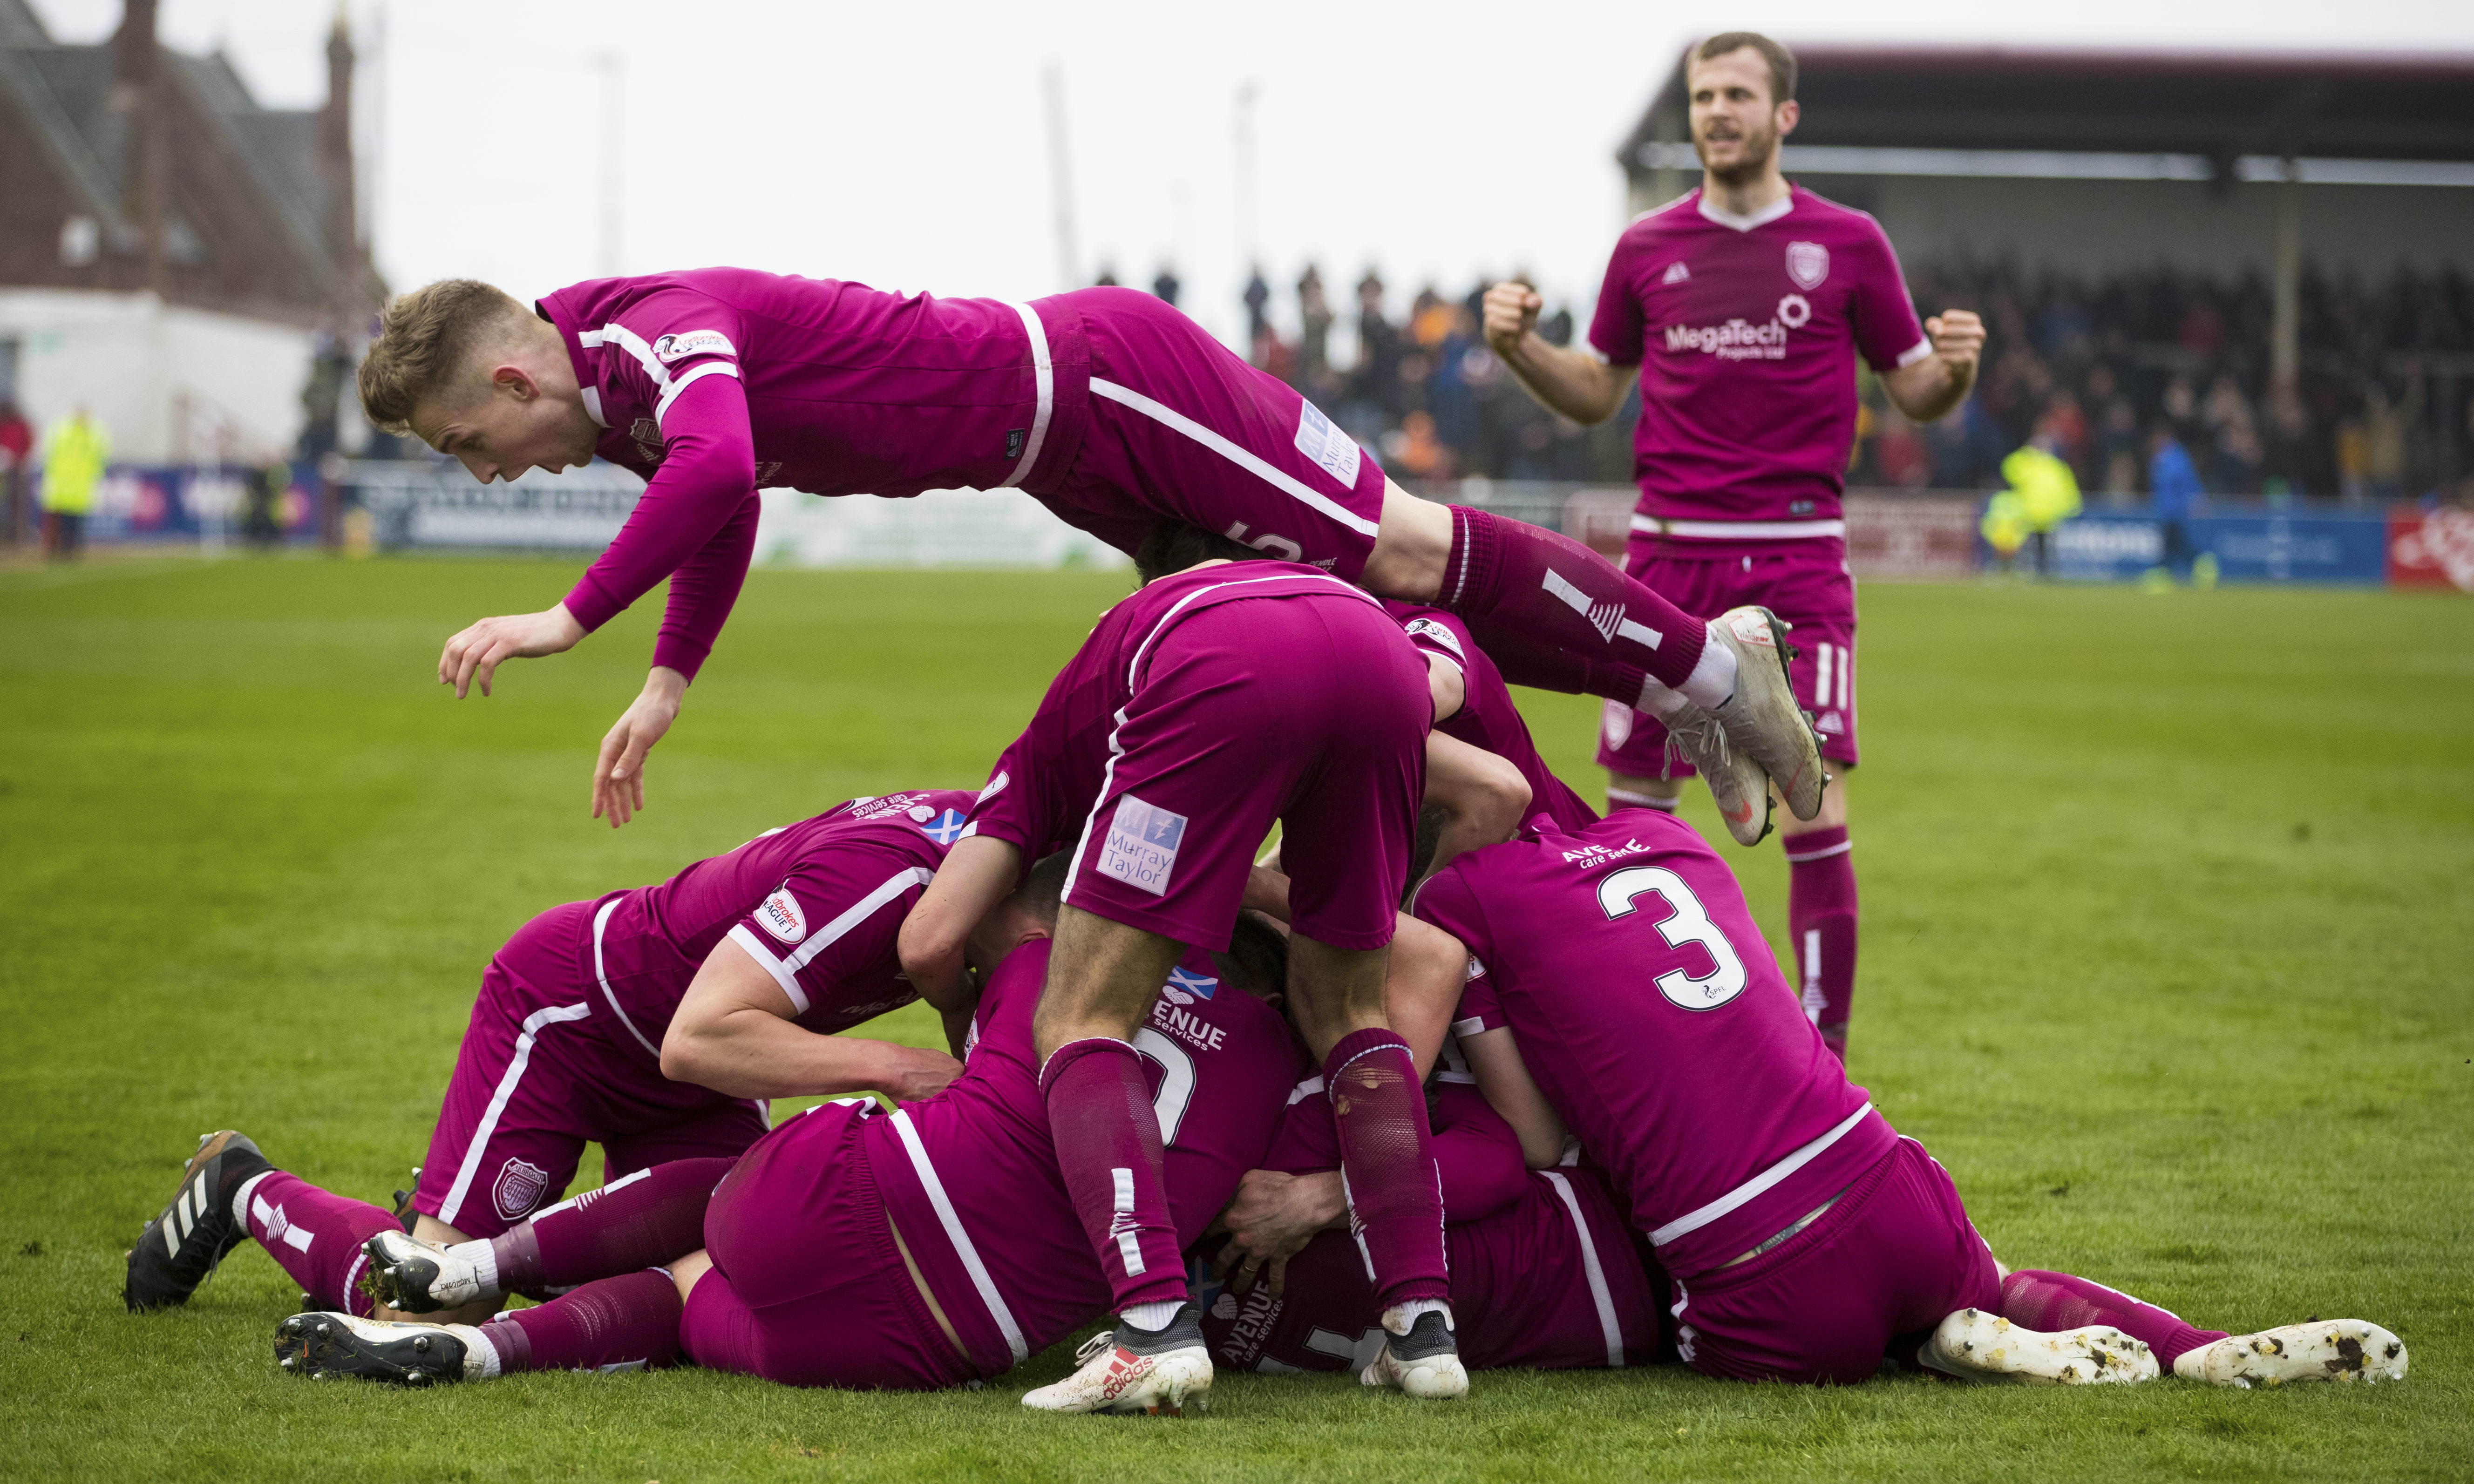 Arbroath players celebrate.